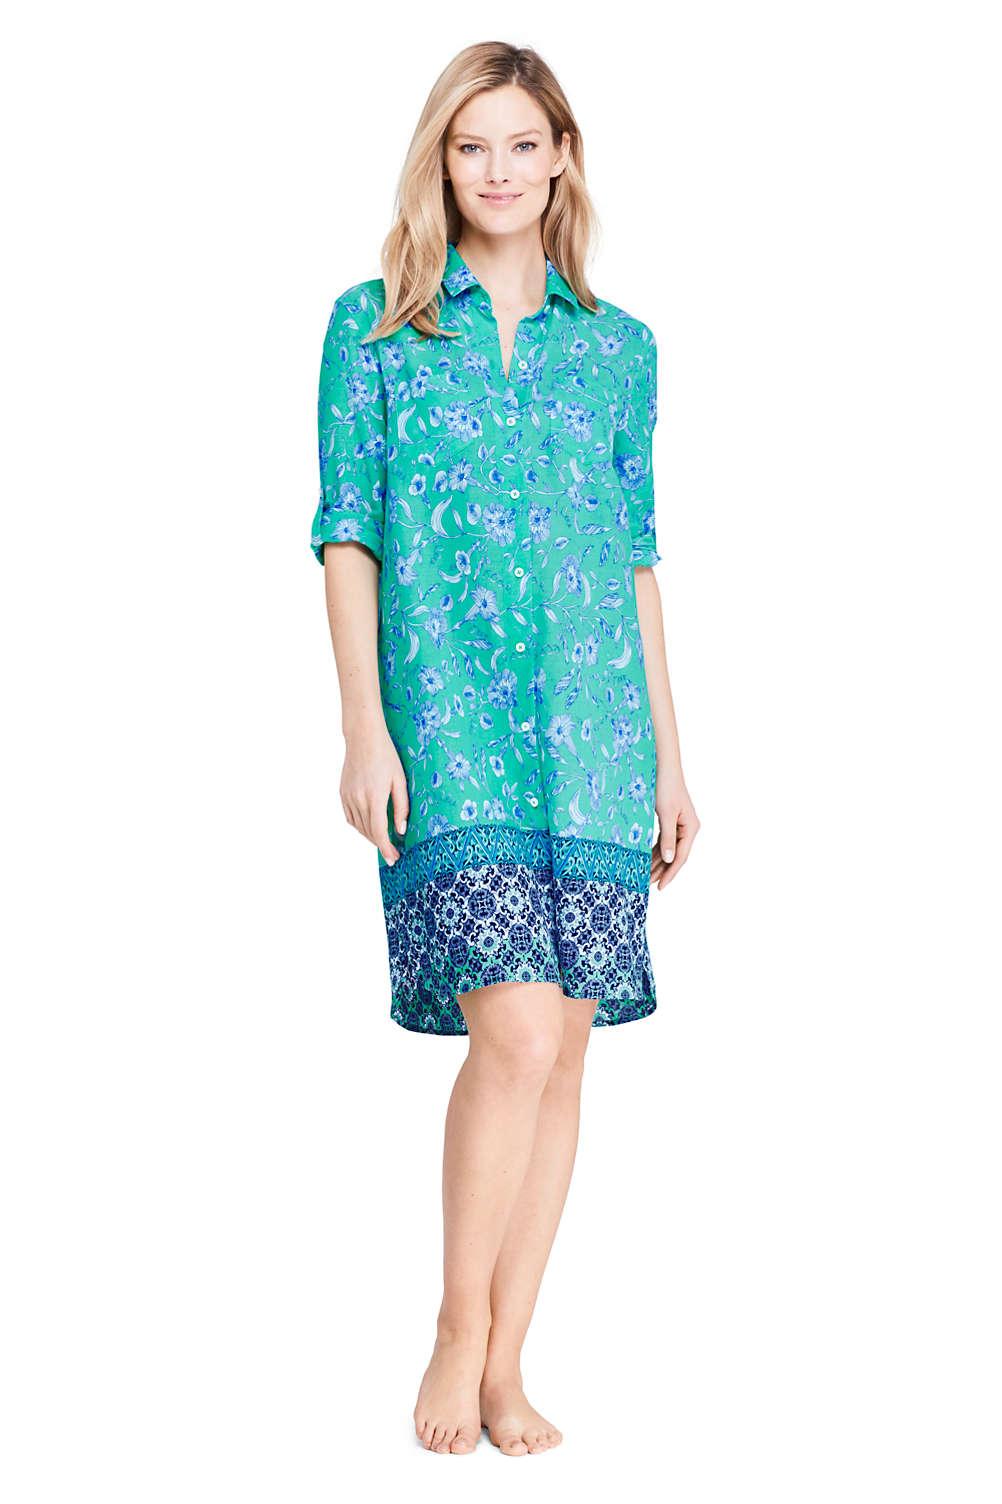 767378e43117f Women's Cotton Button Down Shirt Dress Swim Cover-up Print from Lands' End